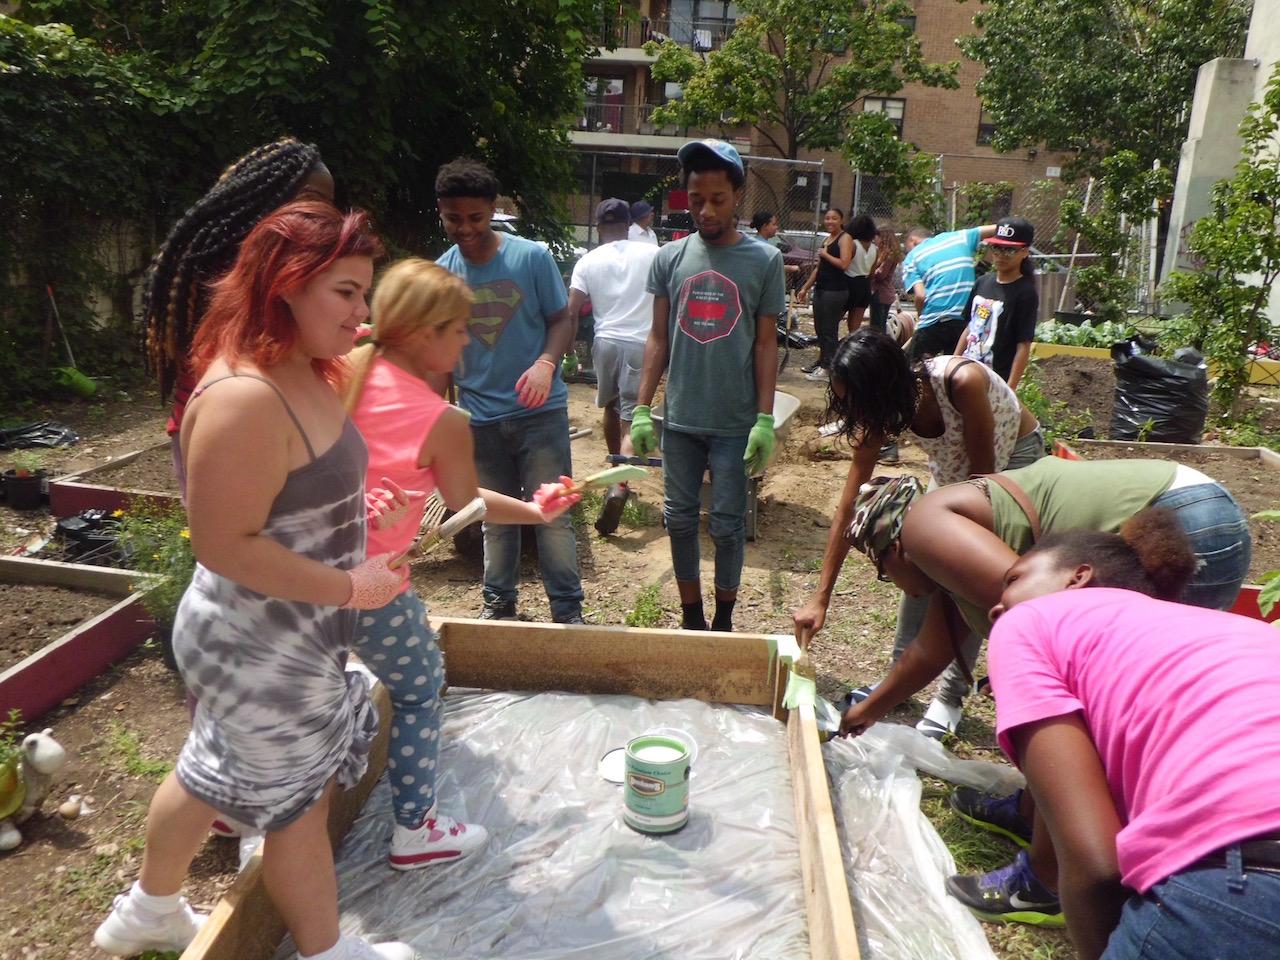 Break-ins decimate Longwood garden